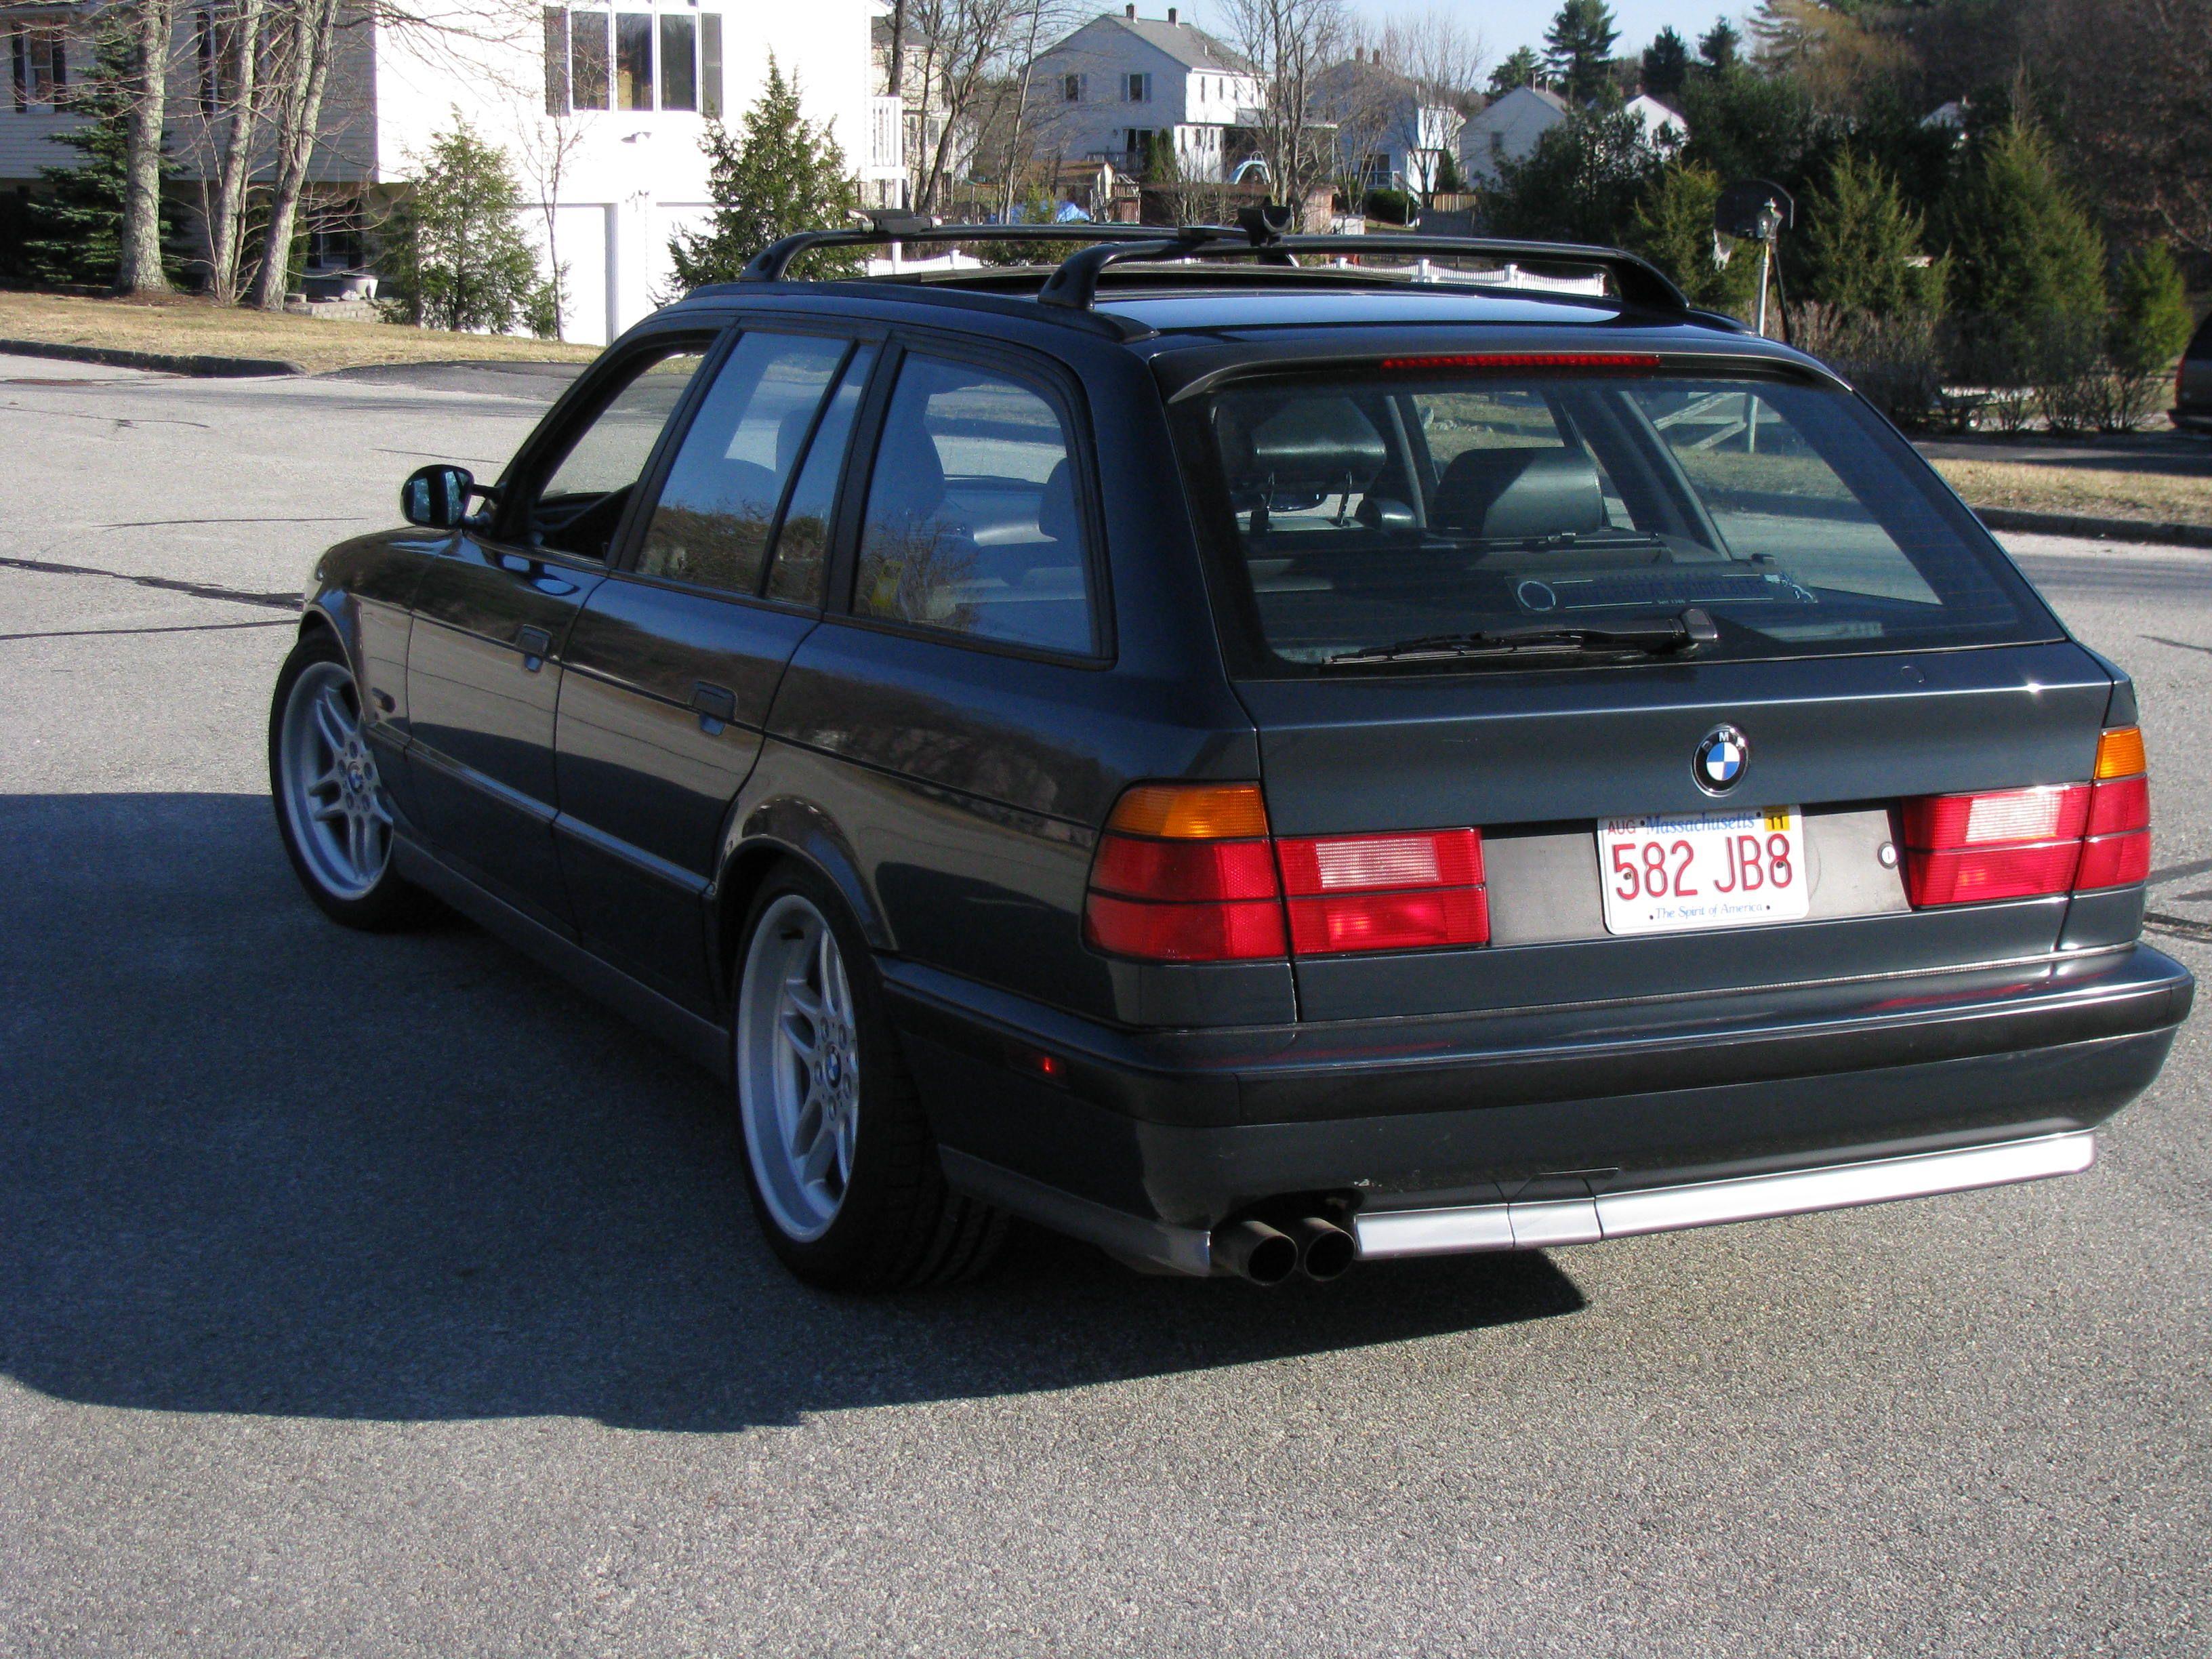 1995 BMW E34 M5 Touring | Bmw e34 | Pinterest | BMW, Cars and BMW M5